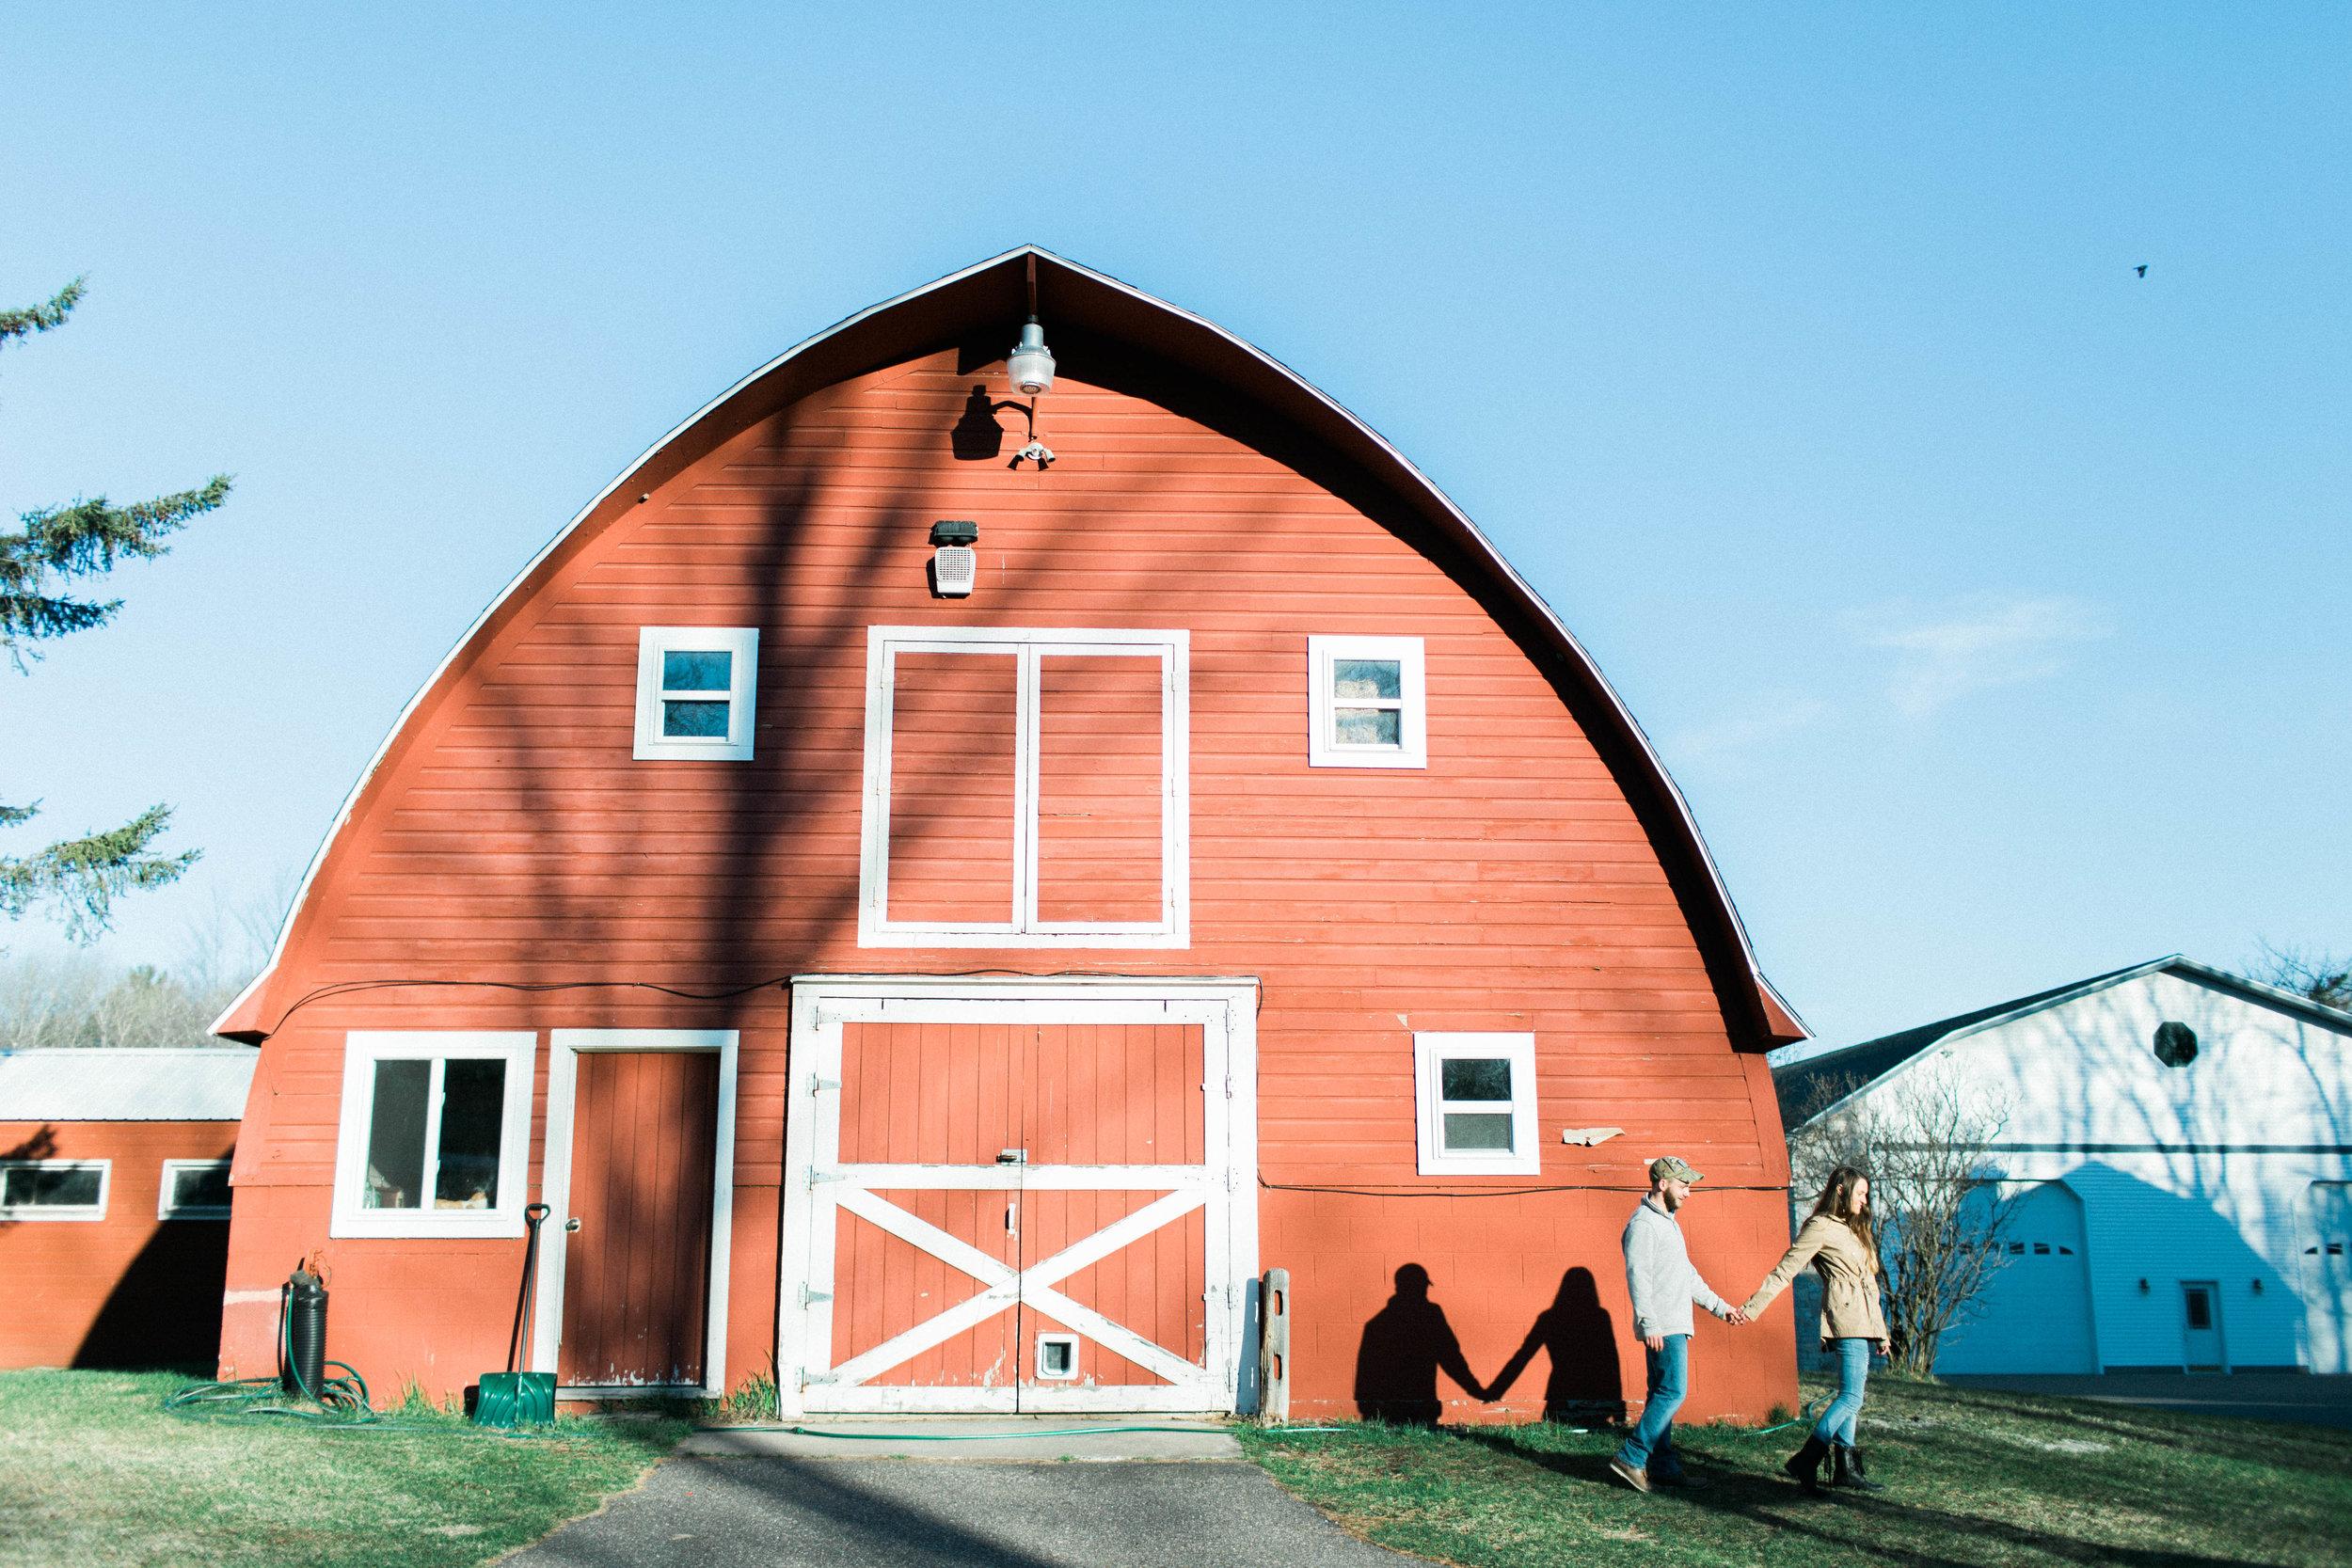 Horse Farm Engagment - Sabrina Leigh Studios - Northern Michigan Wedding Photographer 31.jpg